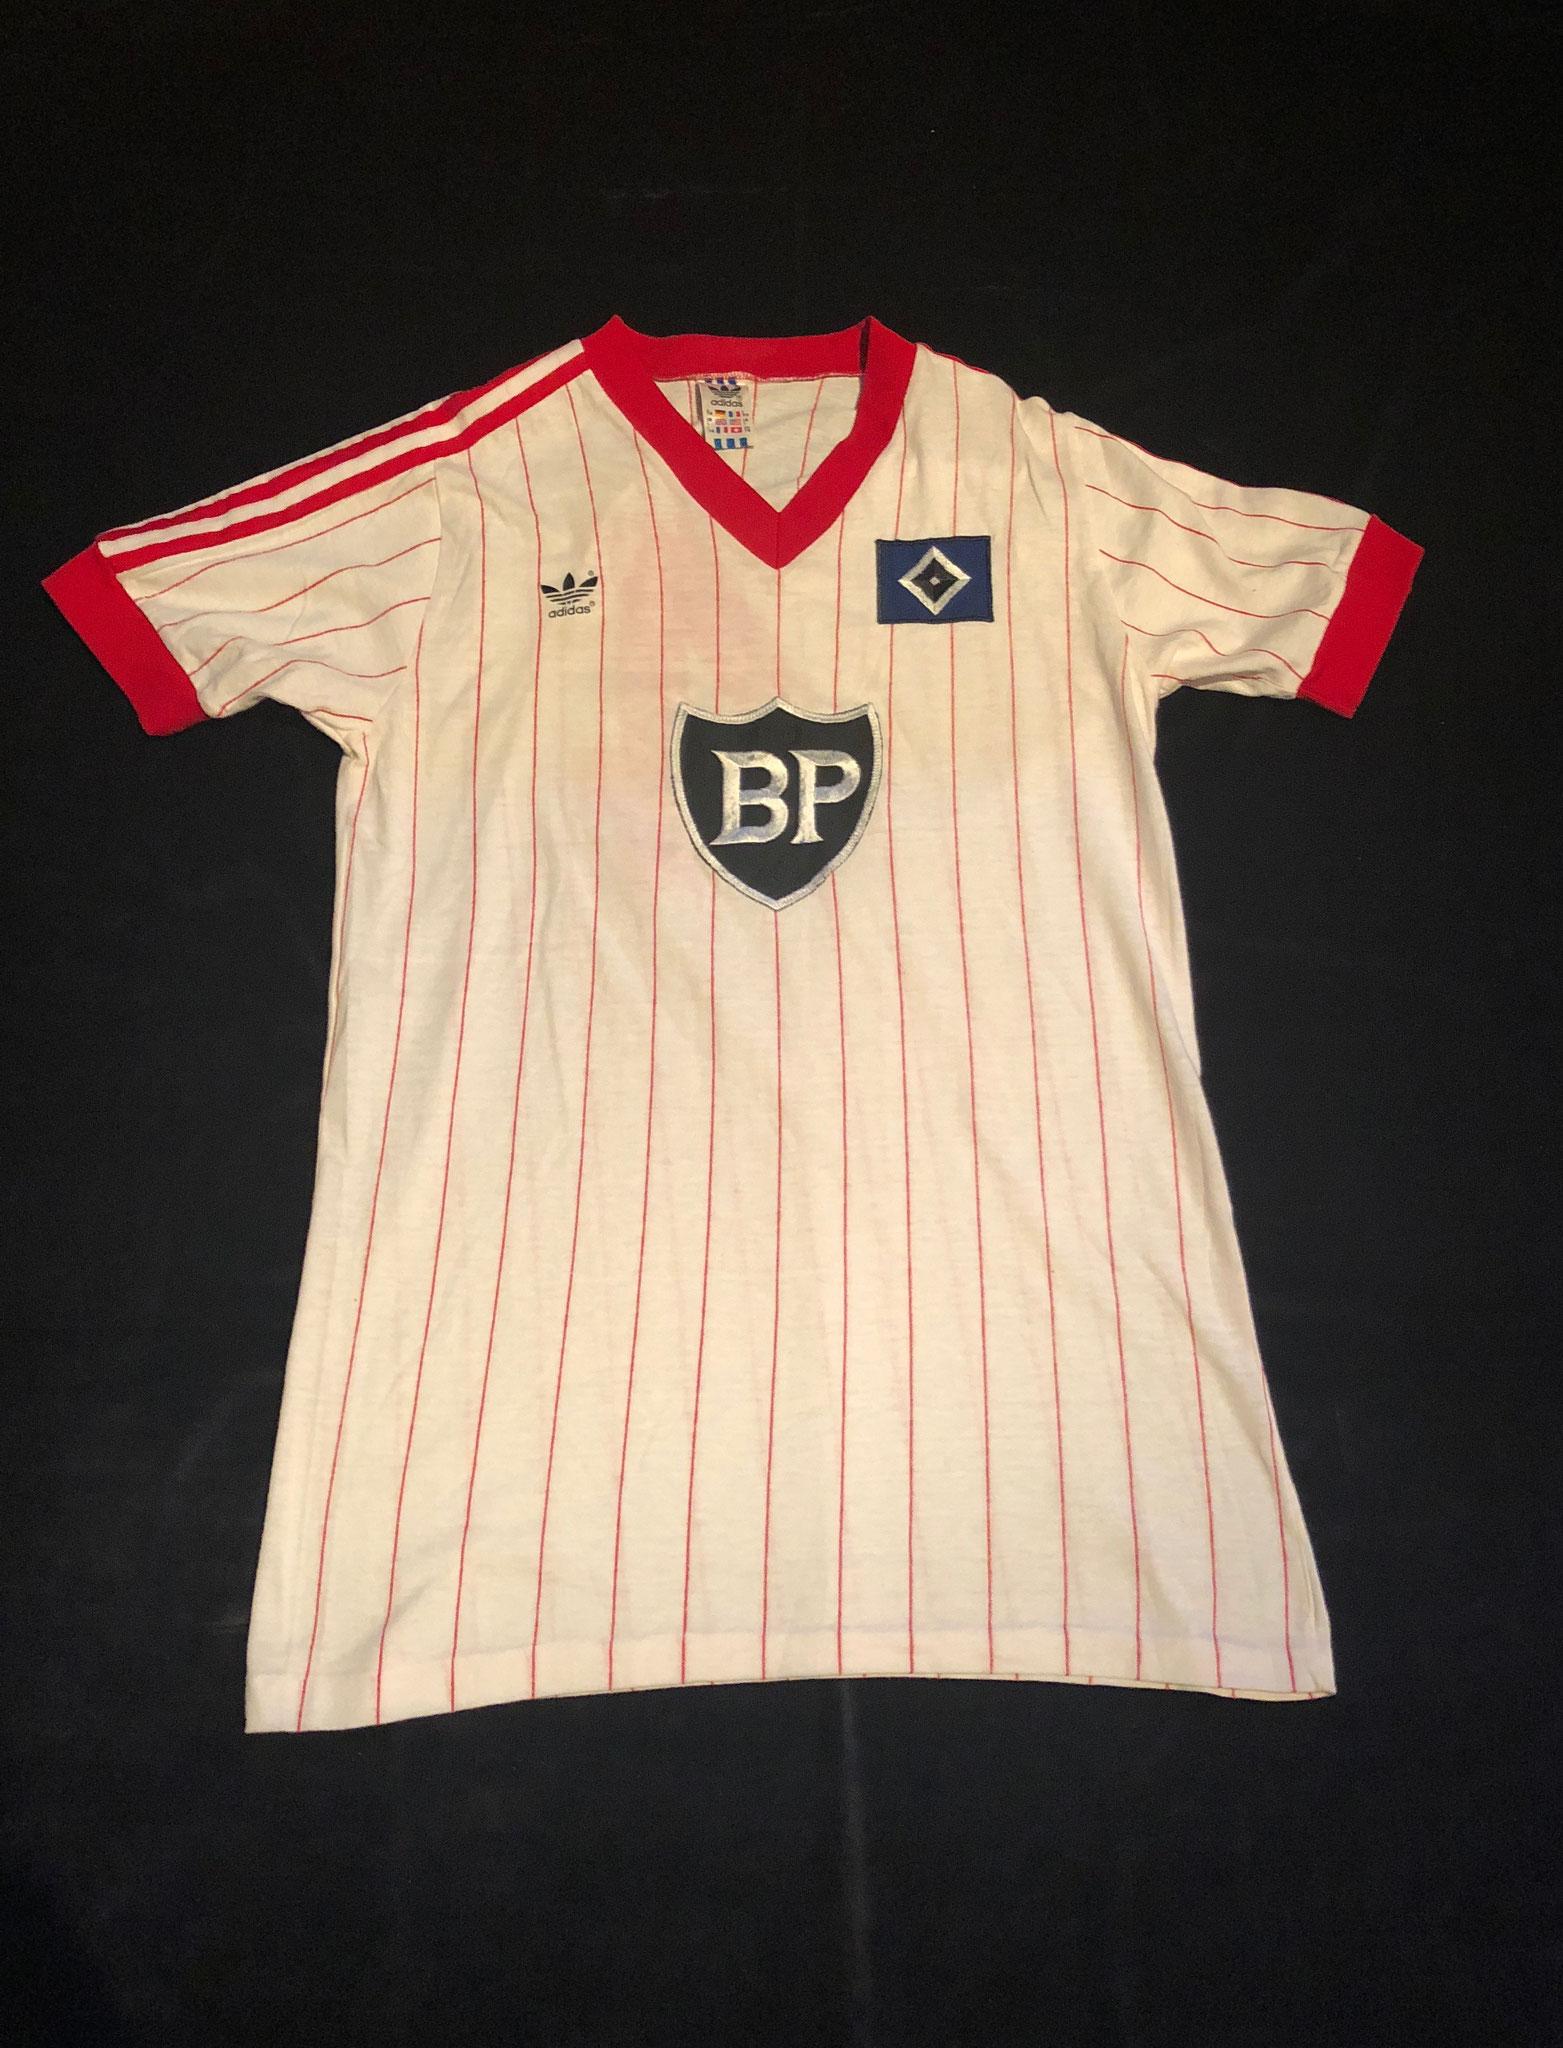 1982/83 - Europapokal der Landesmeister